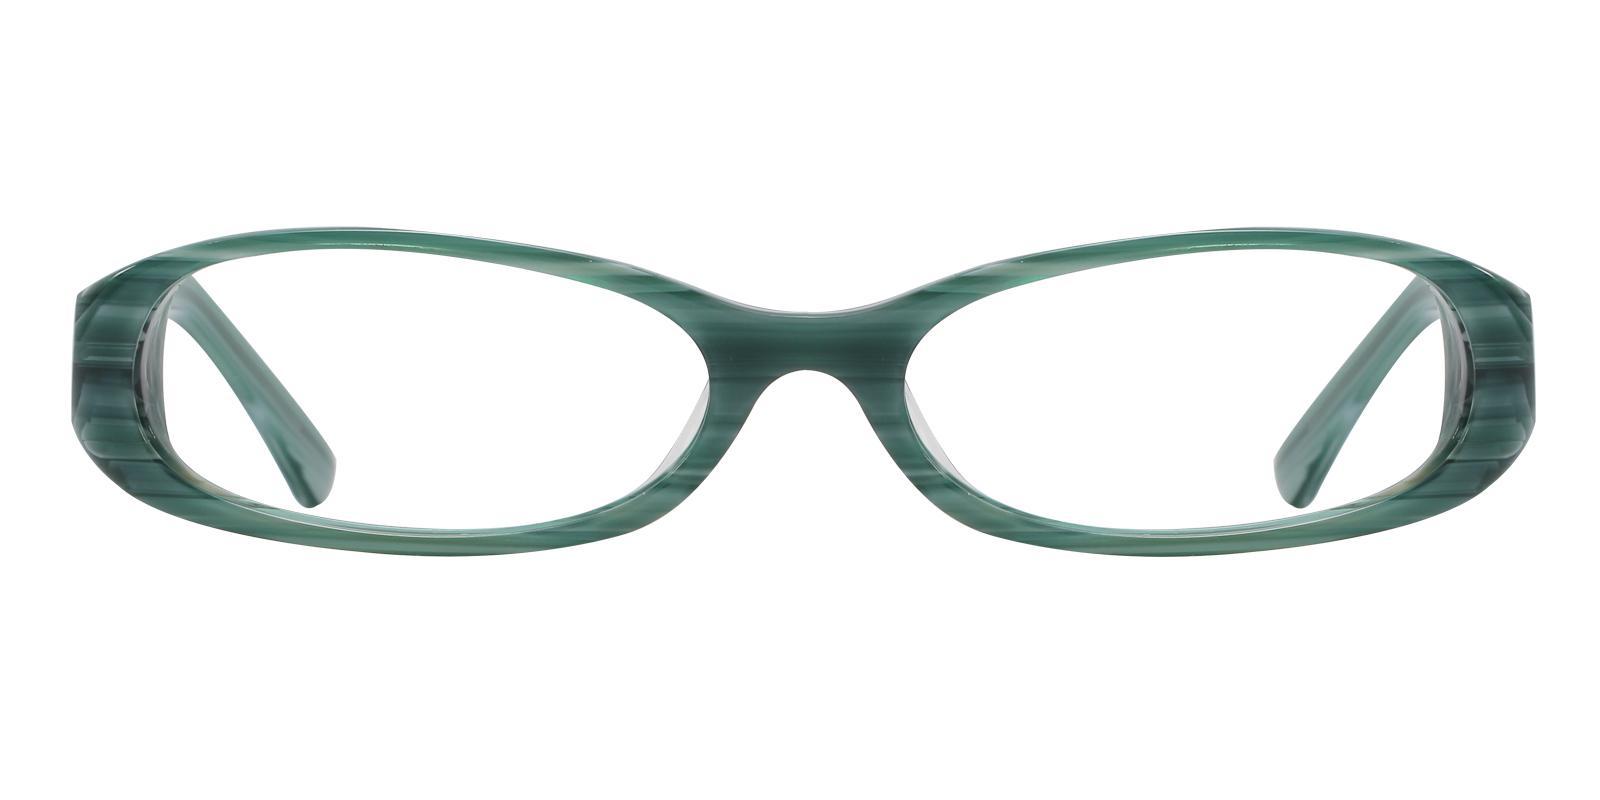 Greenery Green Acetate Eyeglasses , UniversalBridgeFit Frames from ABBE Glasses